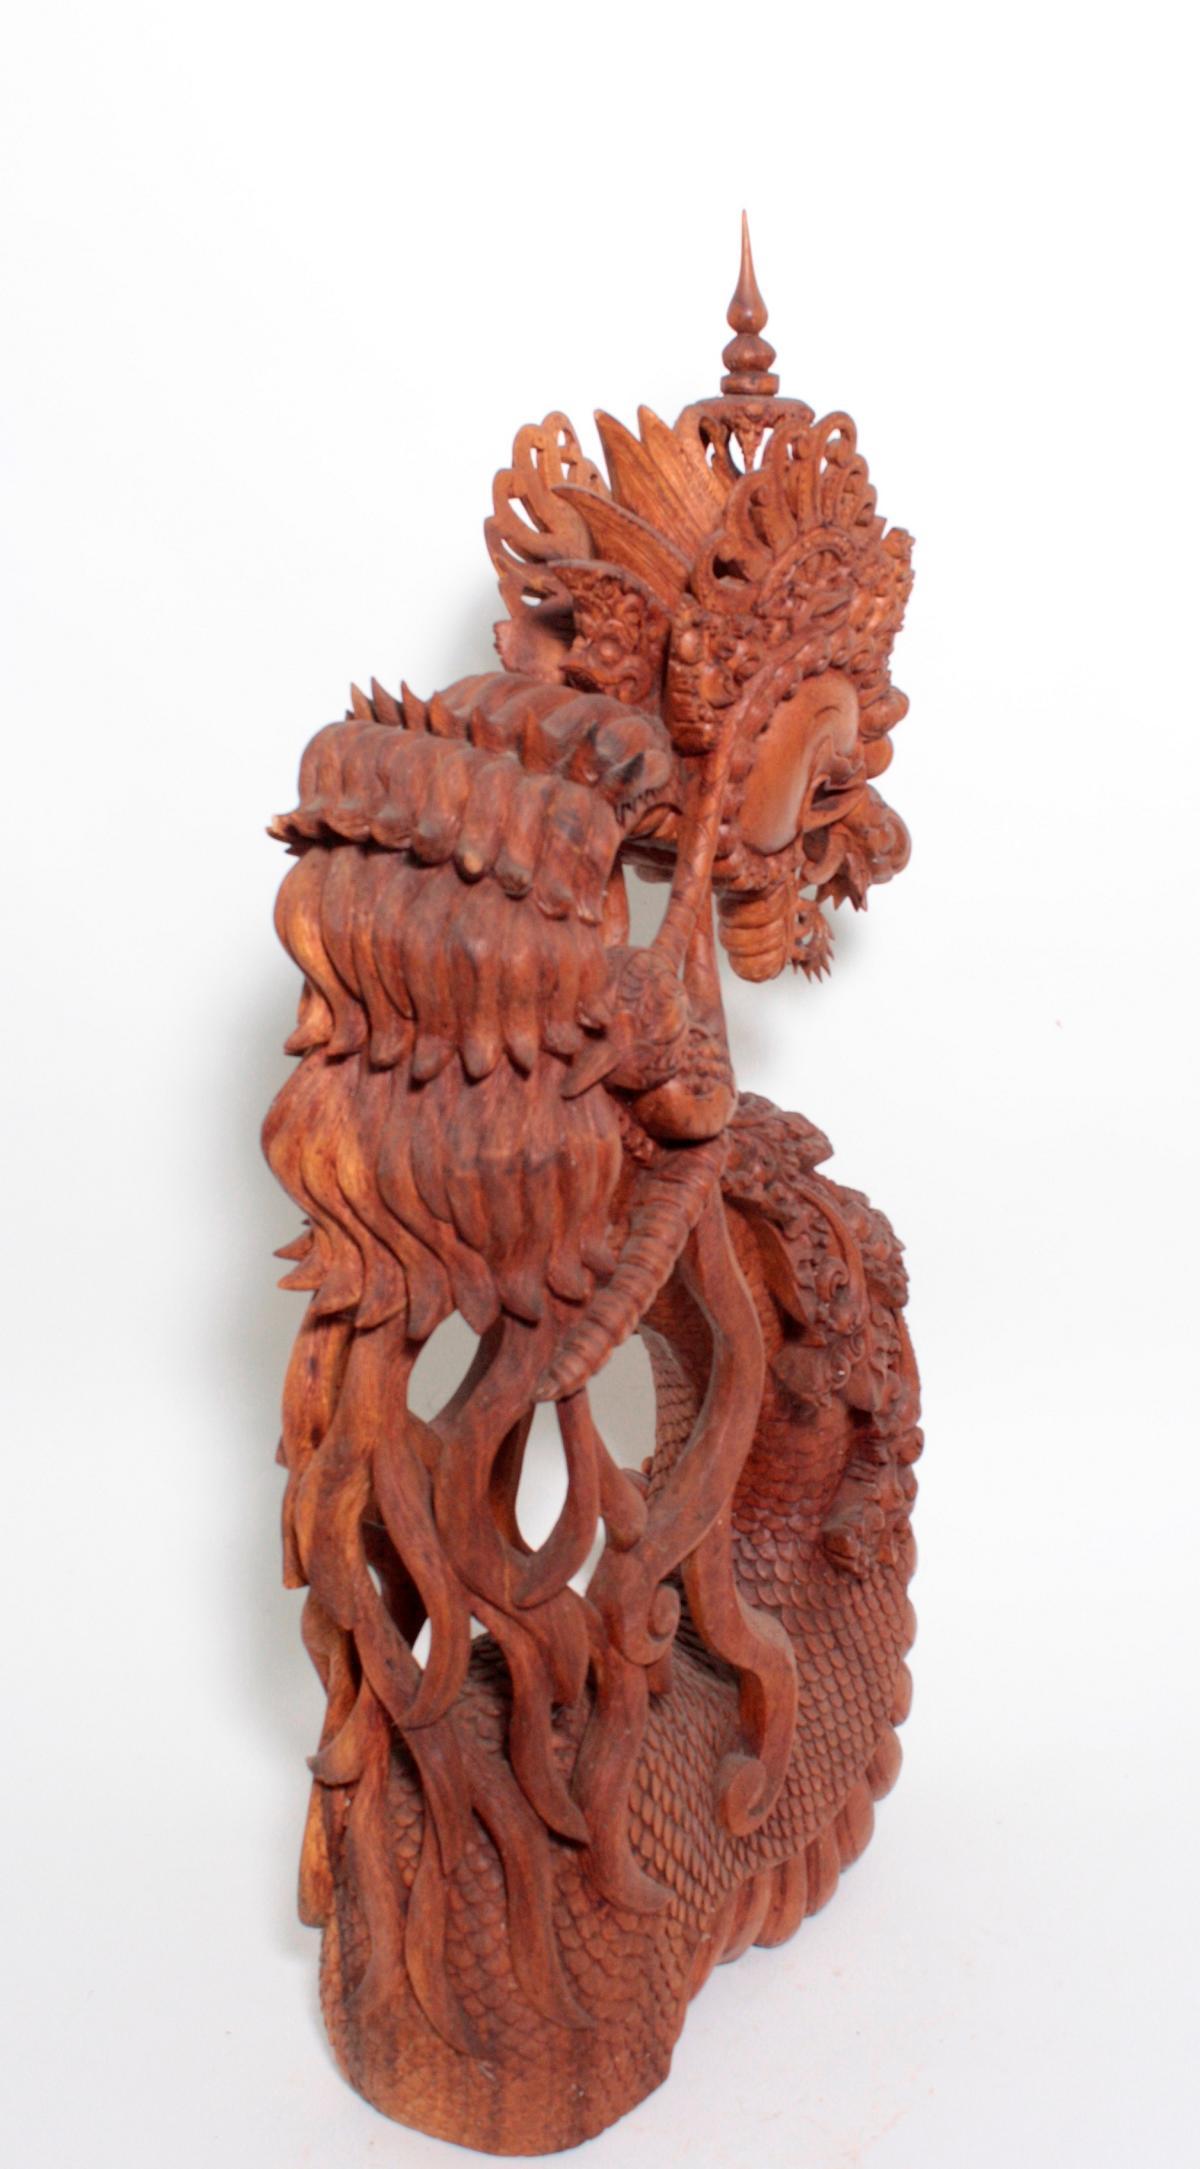 Große Holzskulptur, Drache, Indonesien, 2. Hälfte 20. Jahrhundert-7